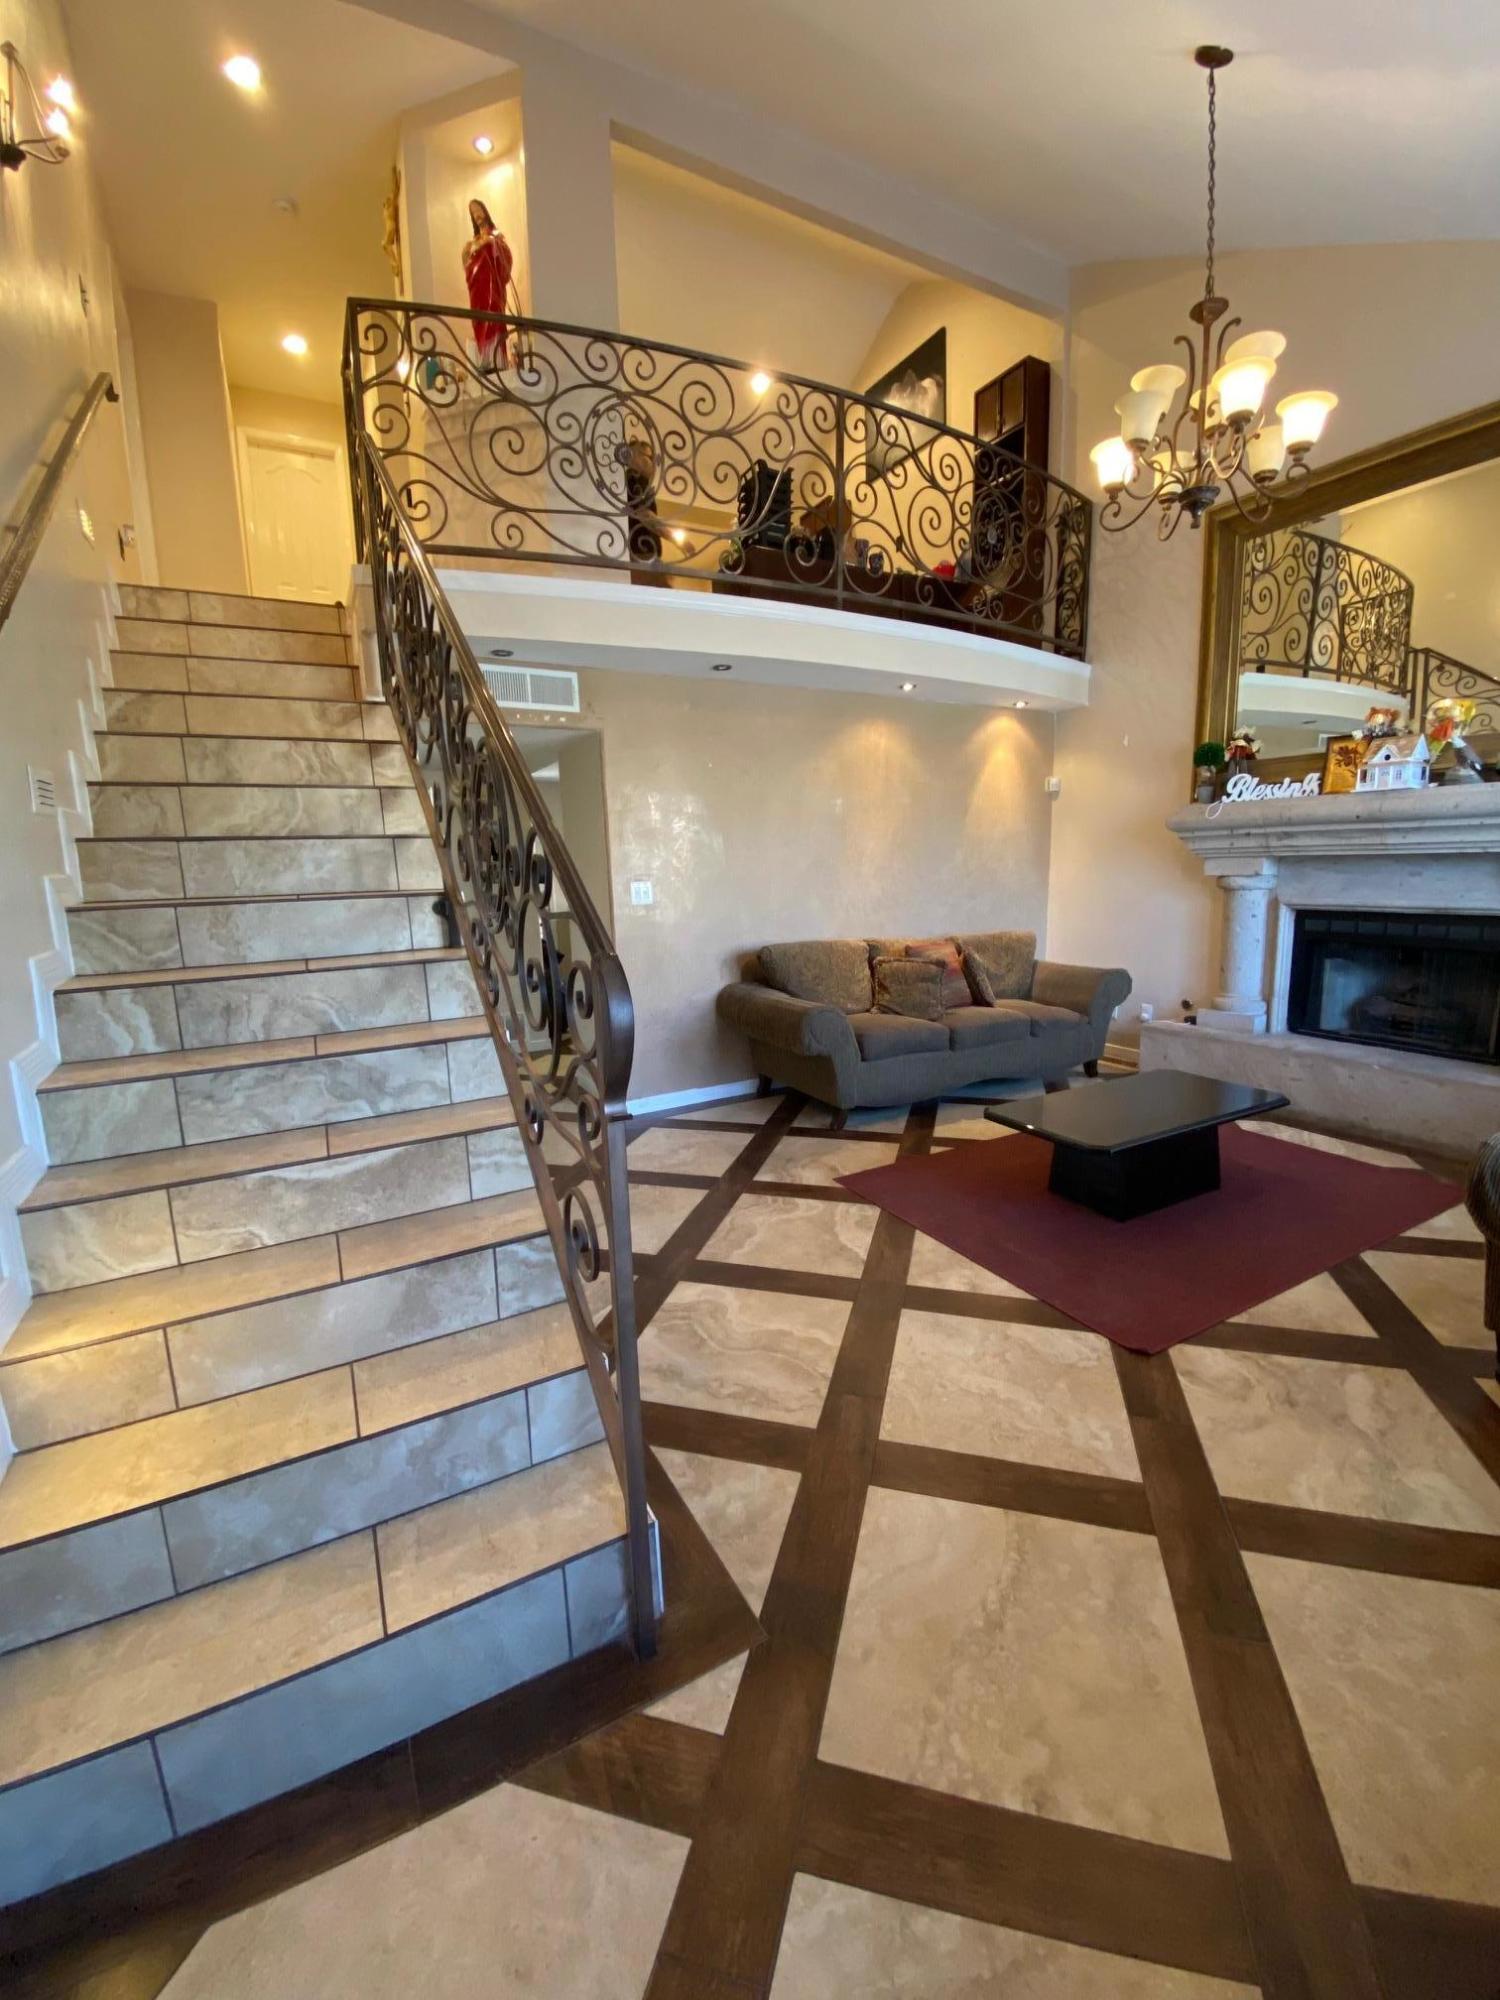 3157 ROYAL JEWEL, El Paso, Texas 79936, 4 Bedrooms Bedrooms, ,3 BathroomsBathrooms,Residential,For sale,ROYAL JEWEL,837315